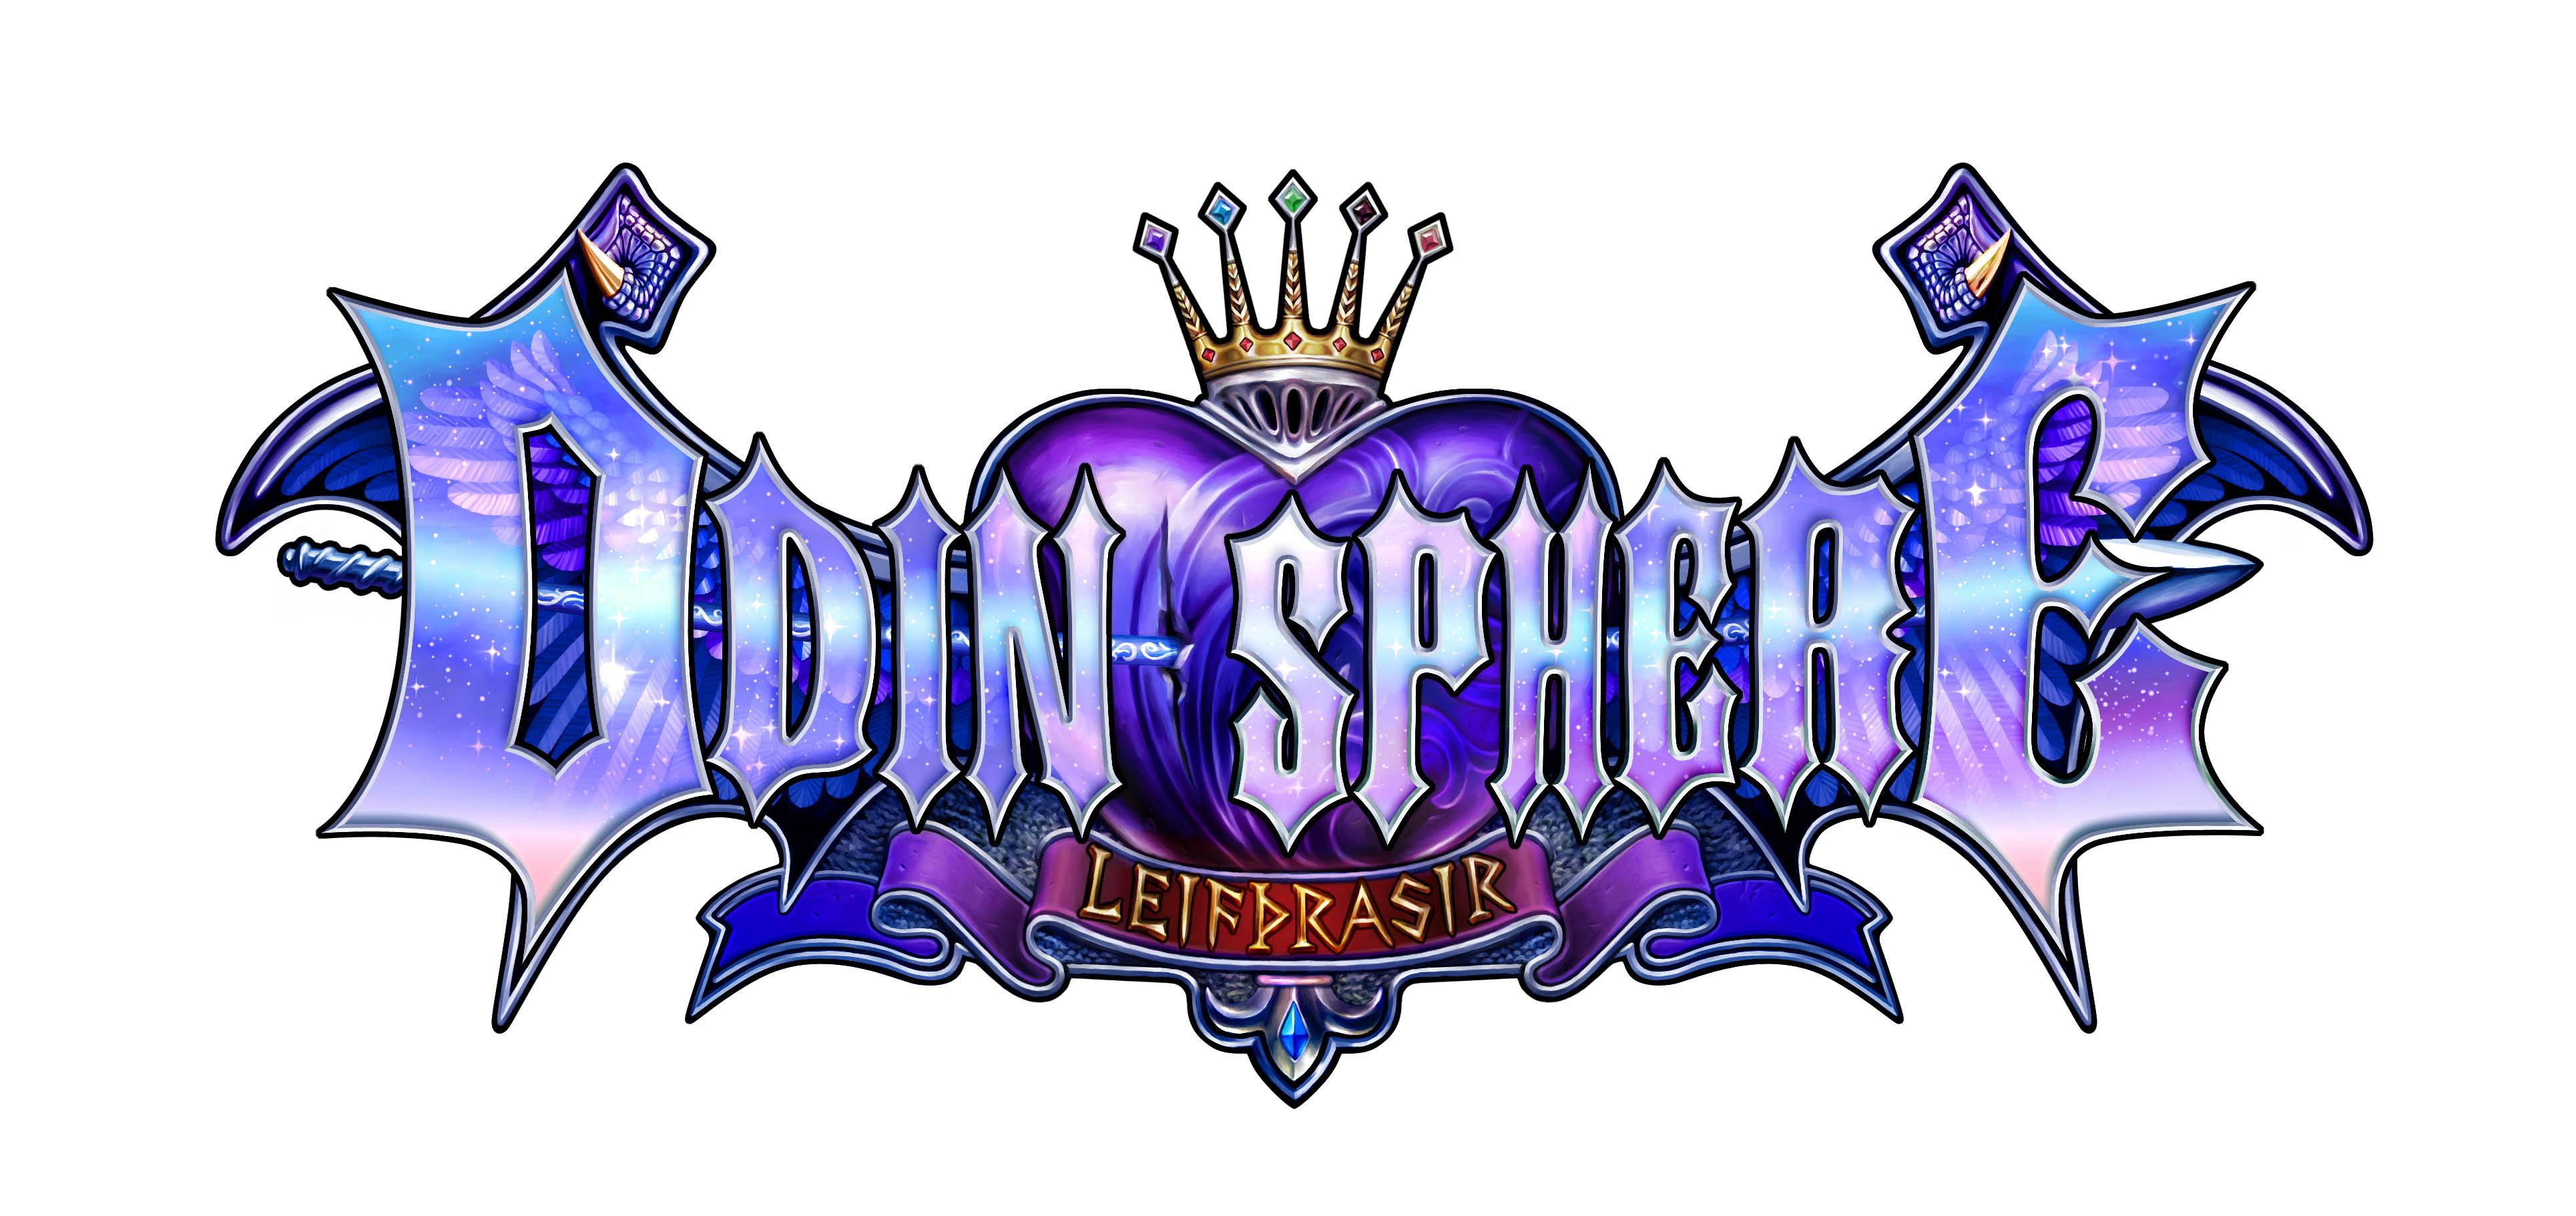 [PS4/PS3/PSVITA] Odin Sphere Leifdrasir Odin-Sphere-Leifdrasir-Ann